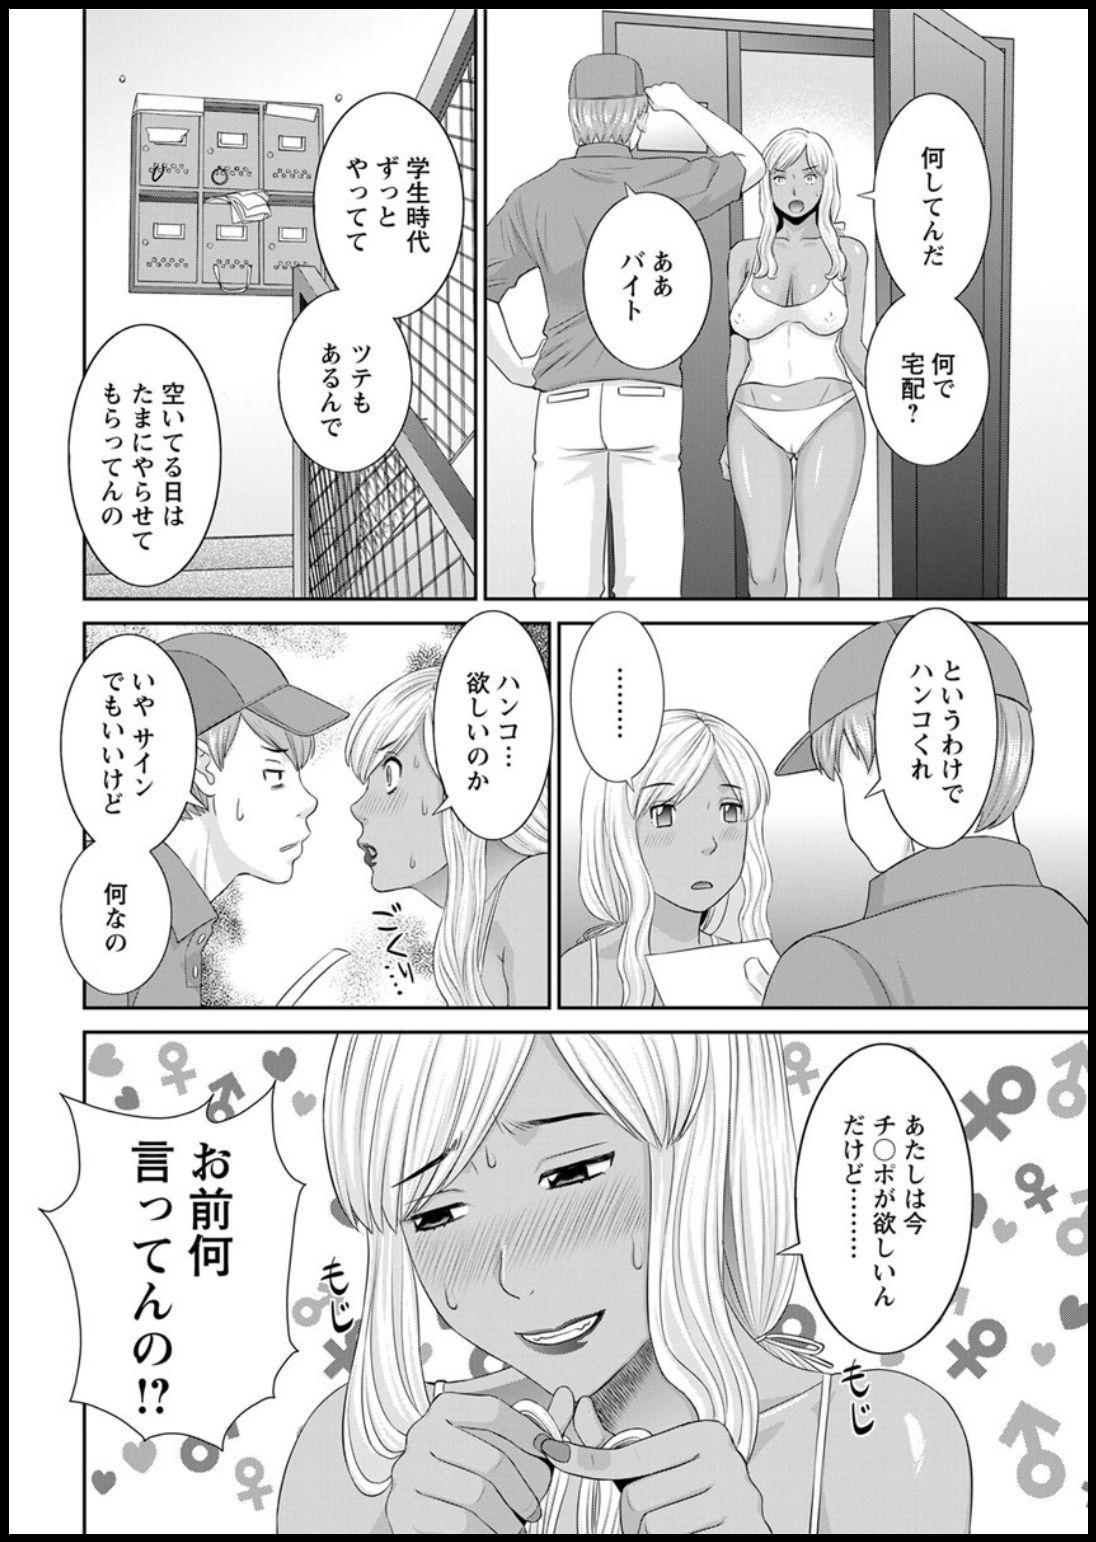 [Kawamori Misaki] Kaikan Hitotsuma Gakuen Ch. 1-6, 8-20 [Digital] 119